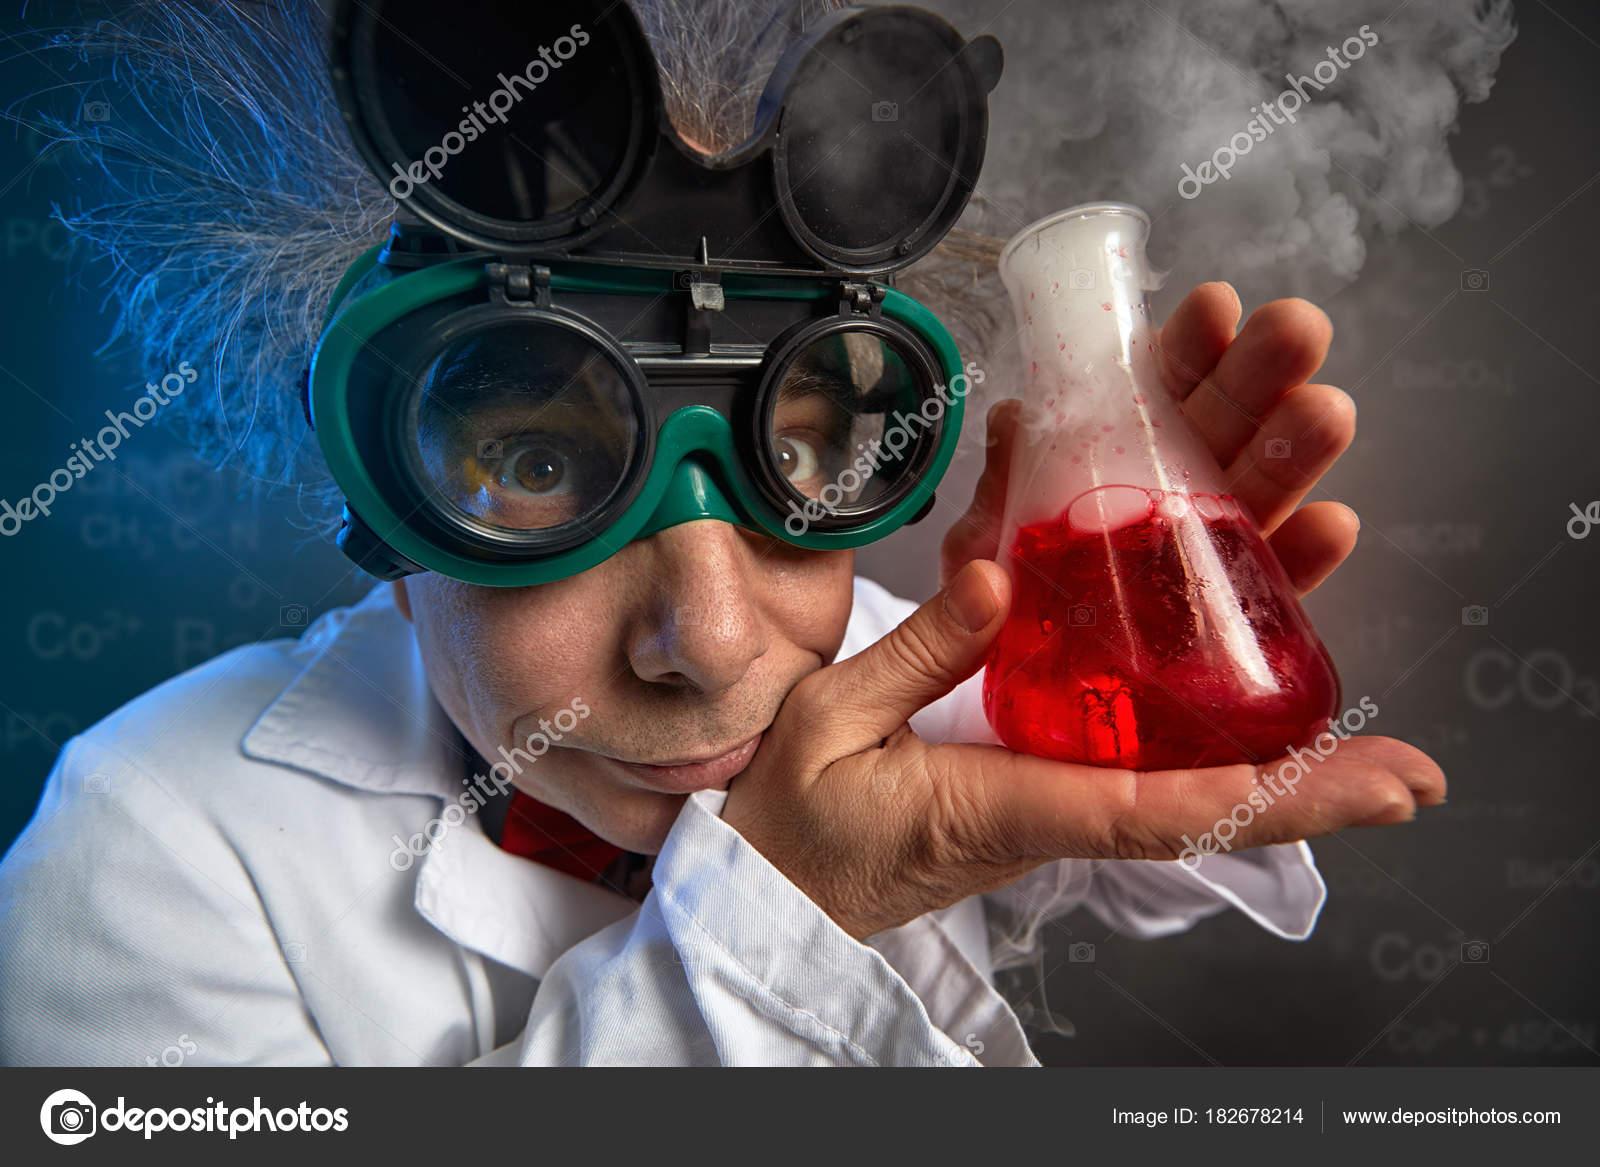 281fcf65e3 Αστεία καθηγητής με προστατευτικά γυαλιά και δοκιμαστικό σωλήνα — Εικόνα  από ...